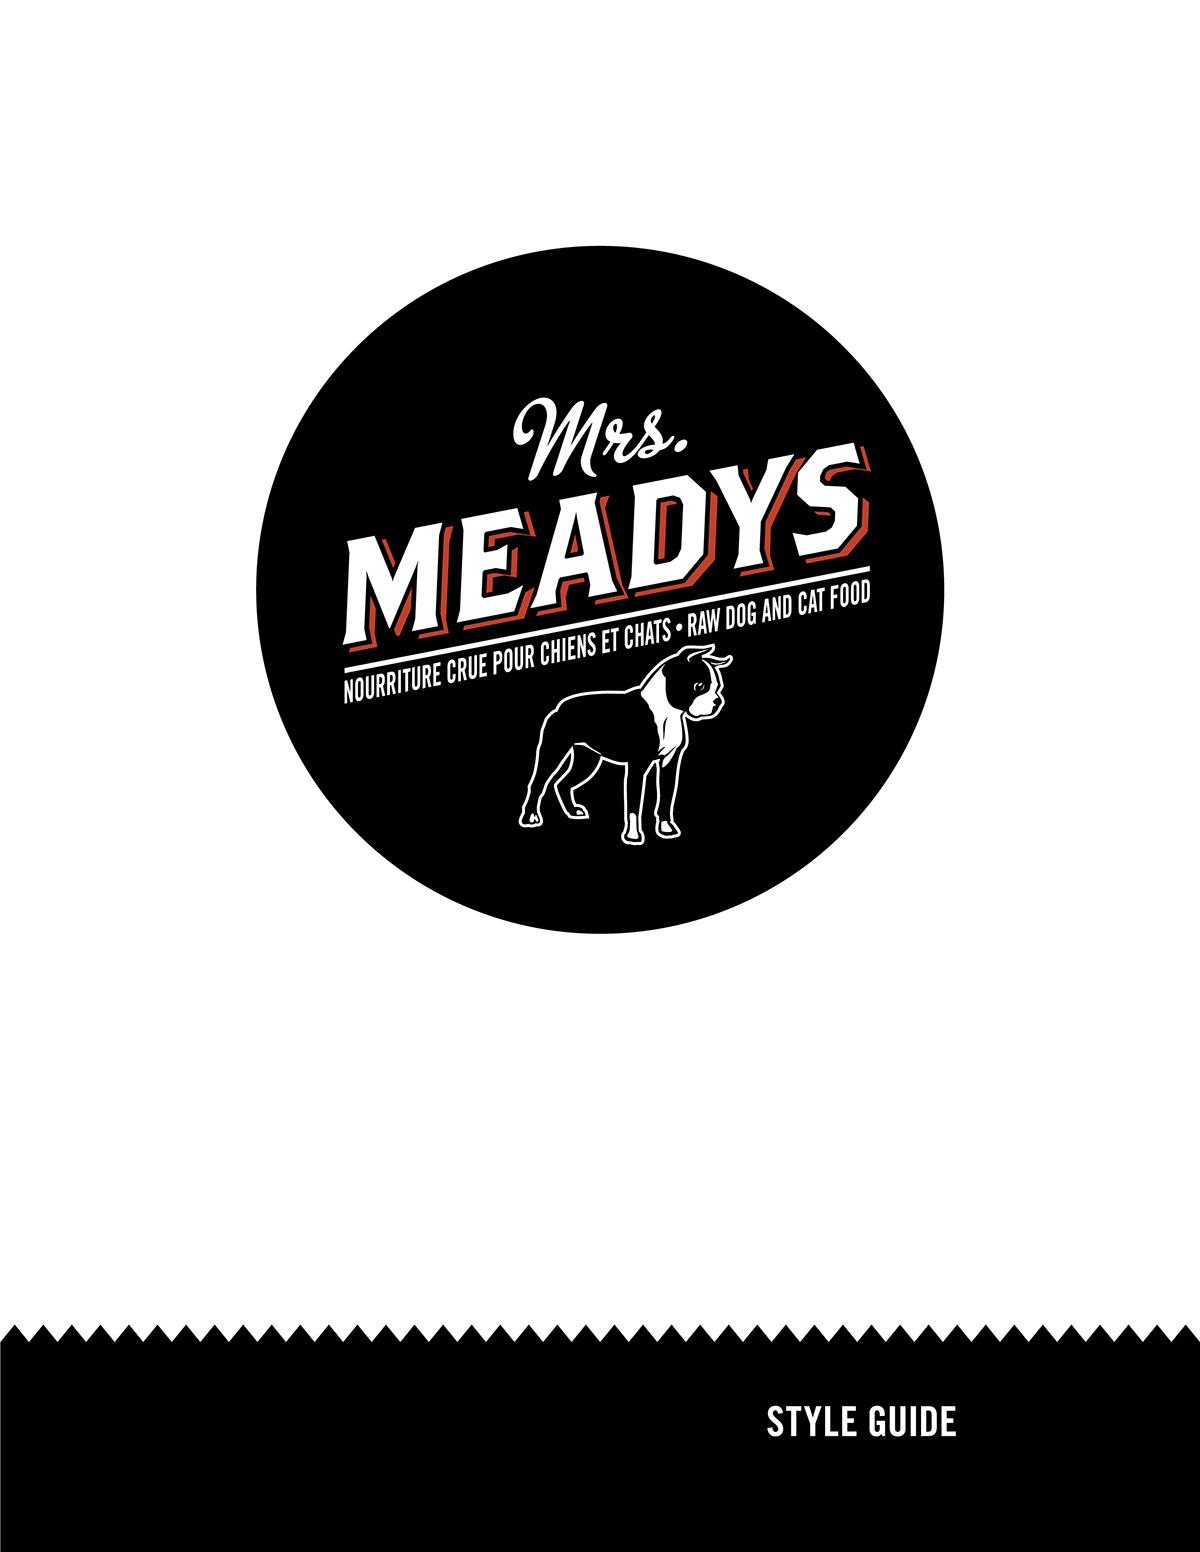 MRS. MEADYS BRAND IDENTITY DESIGN